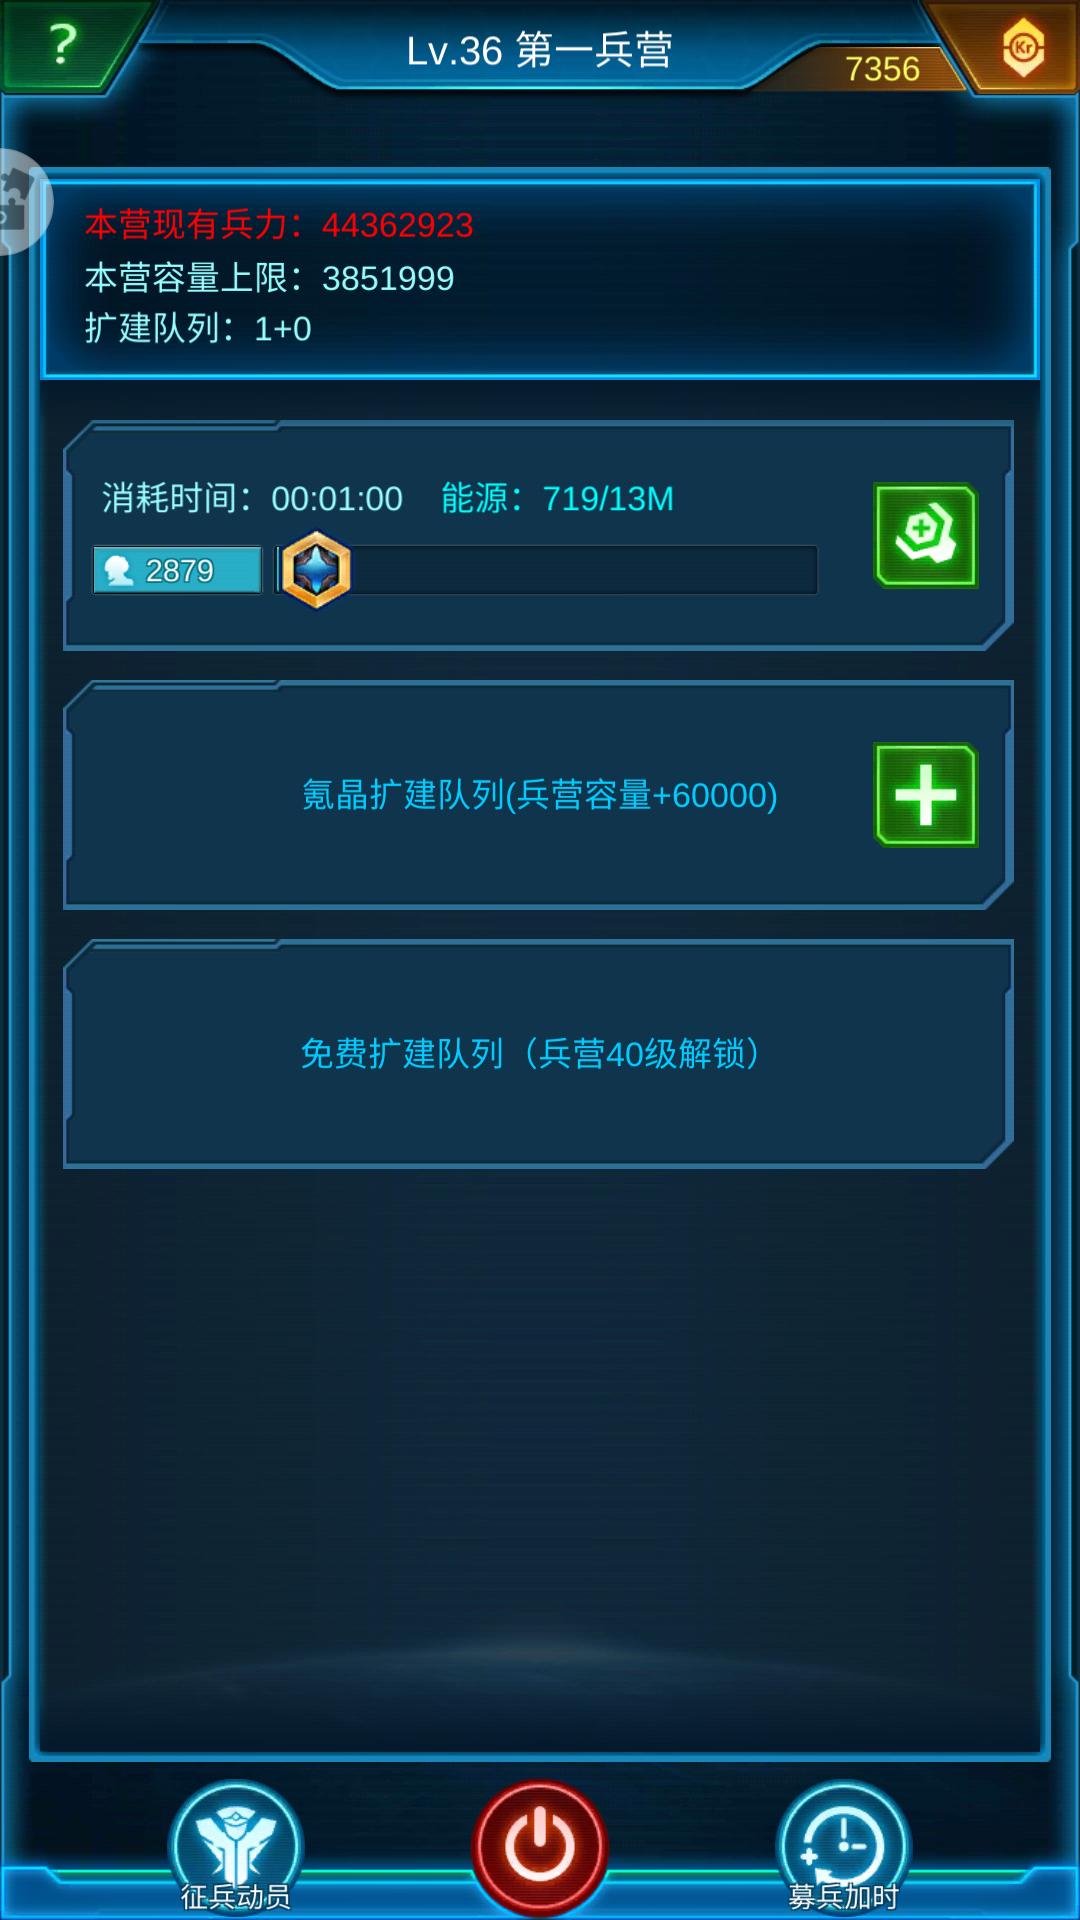 Screenshot_2020-02-04-13-42-50.png